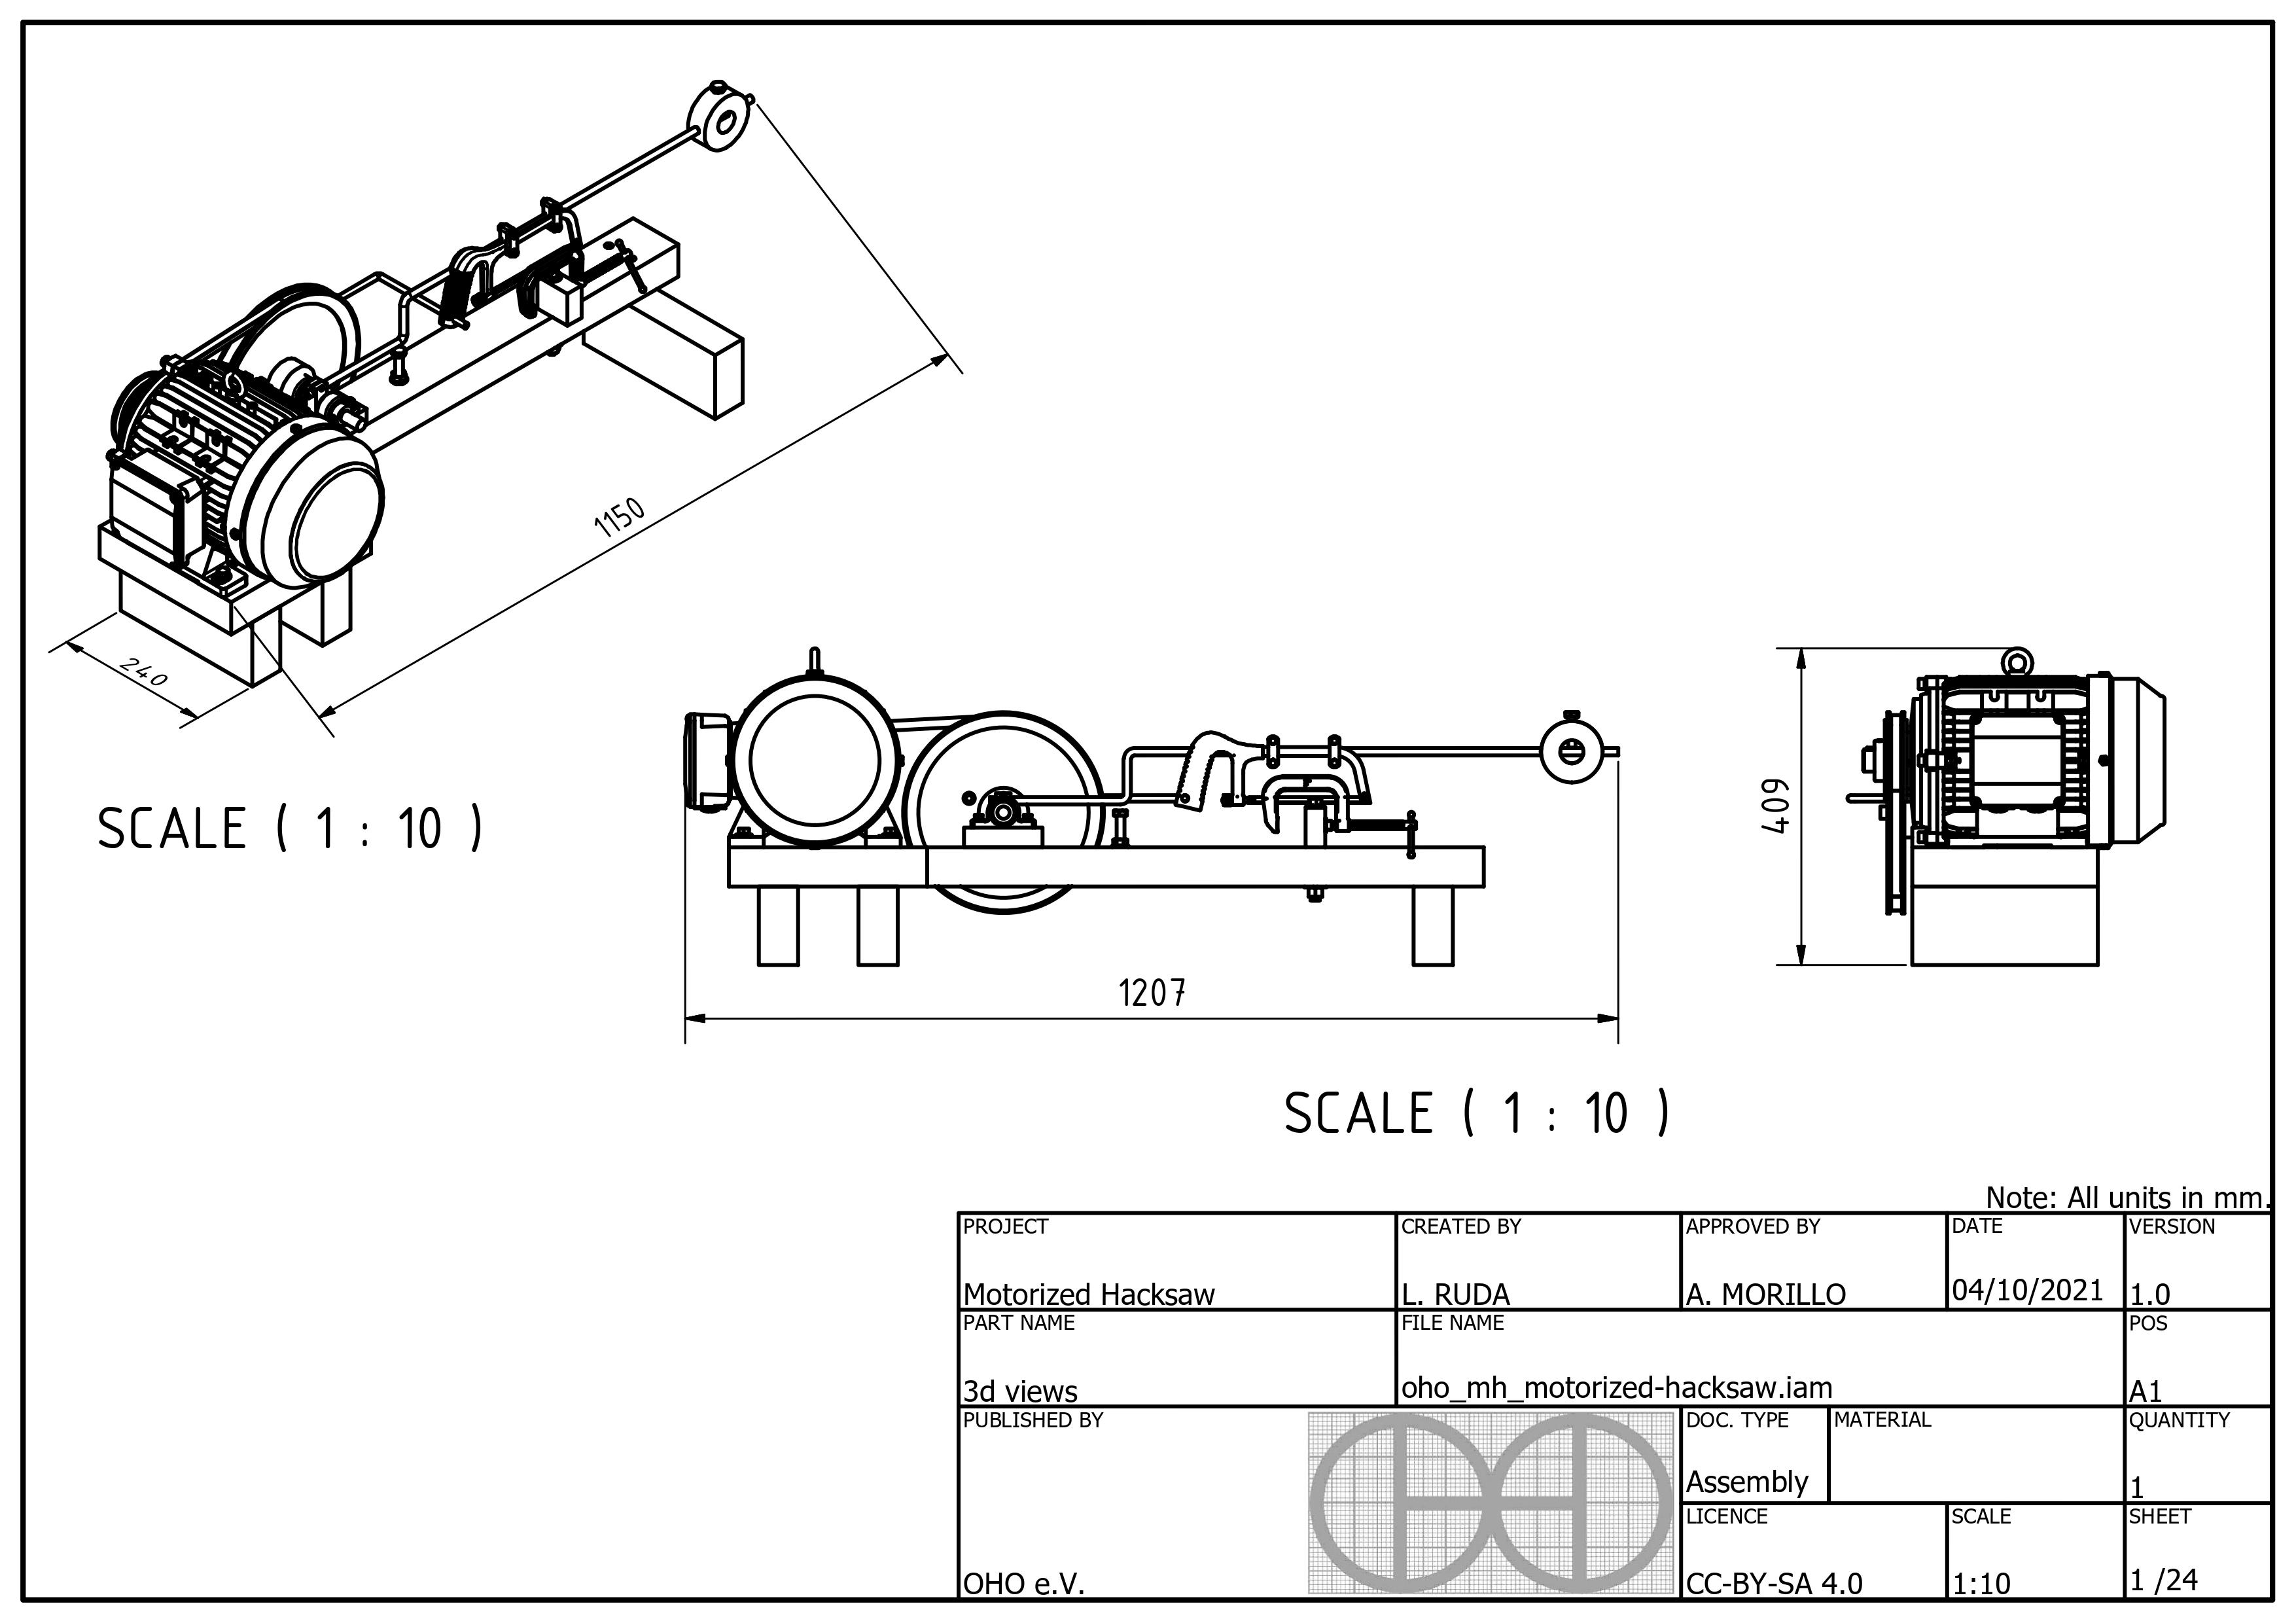 Oho mh motorized-hacksaw 0001.jpg